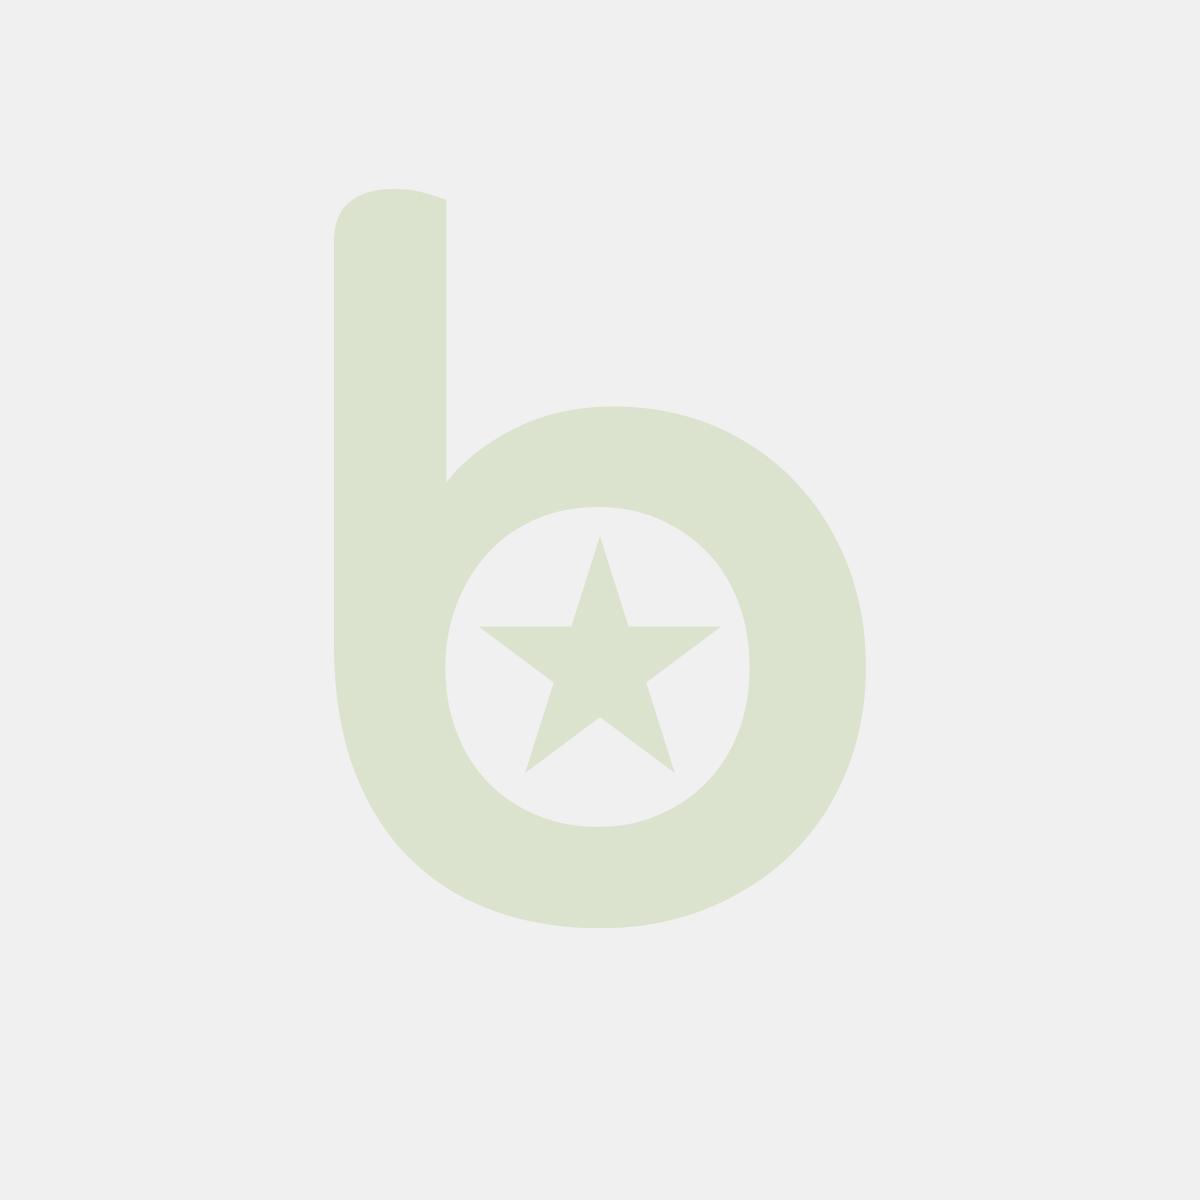 Patyczki 10cm KNOT op.250szt - FINGERFOOD